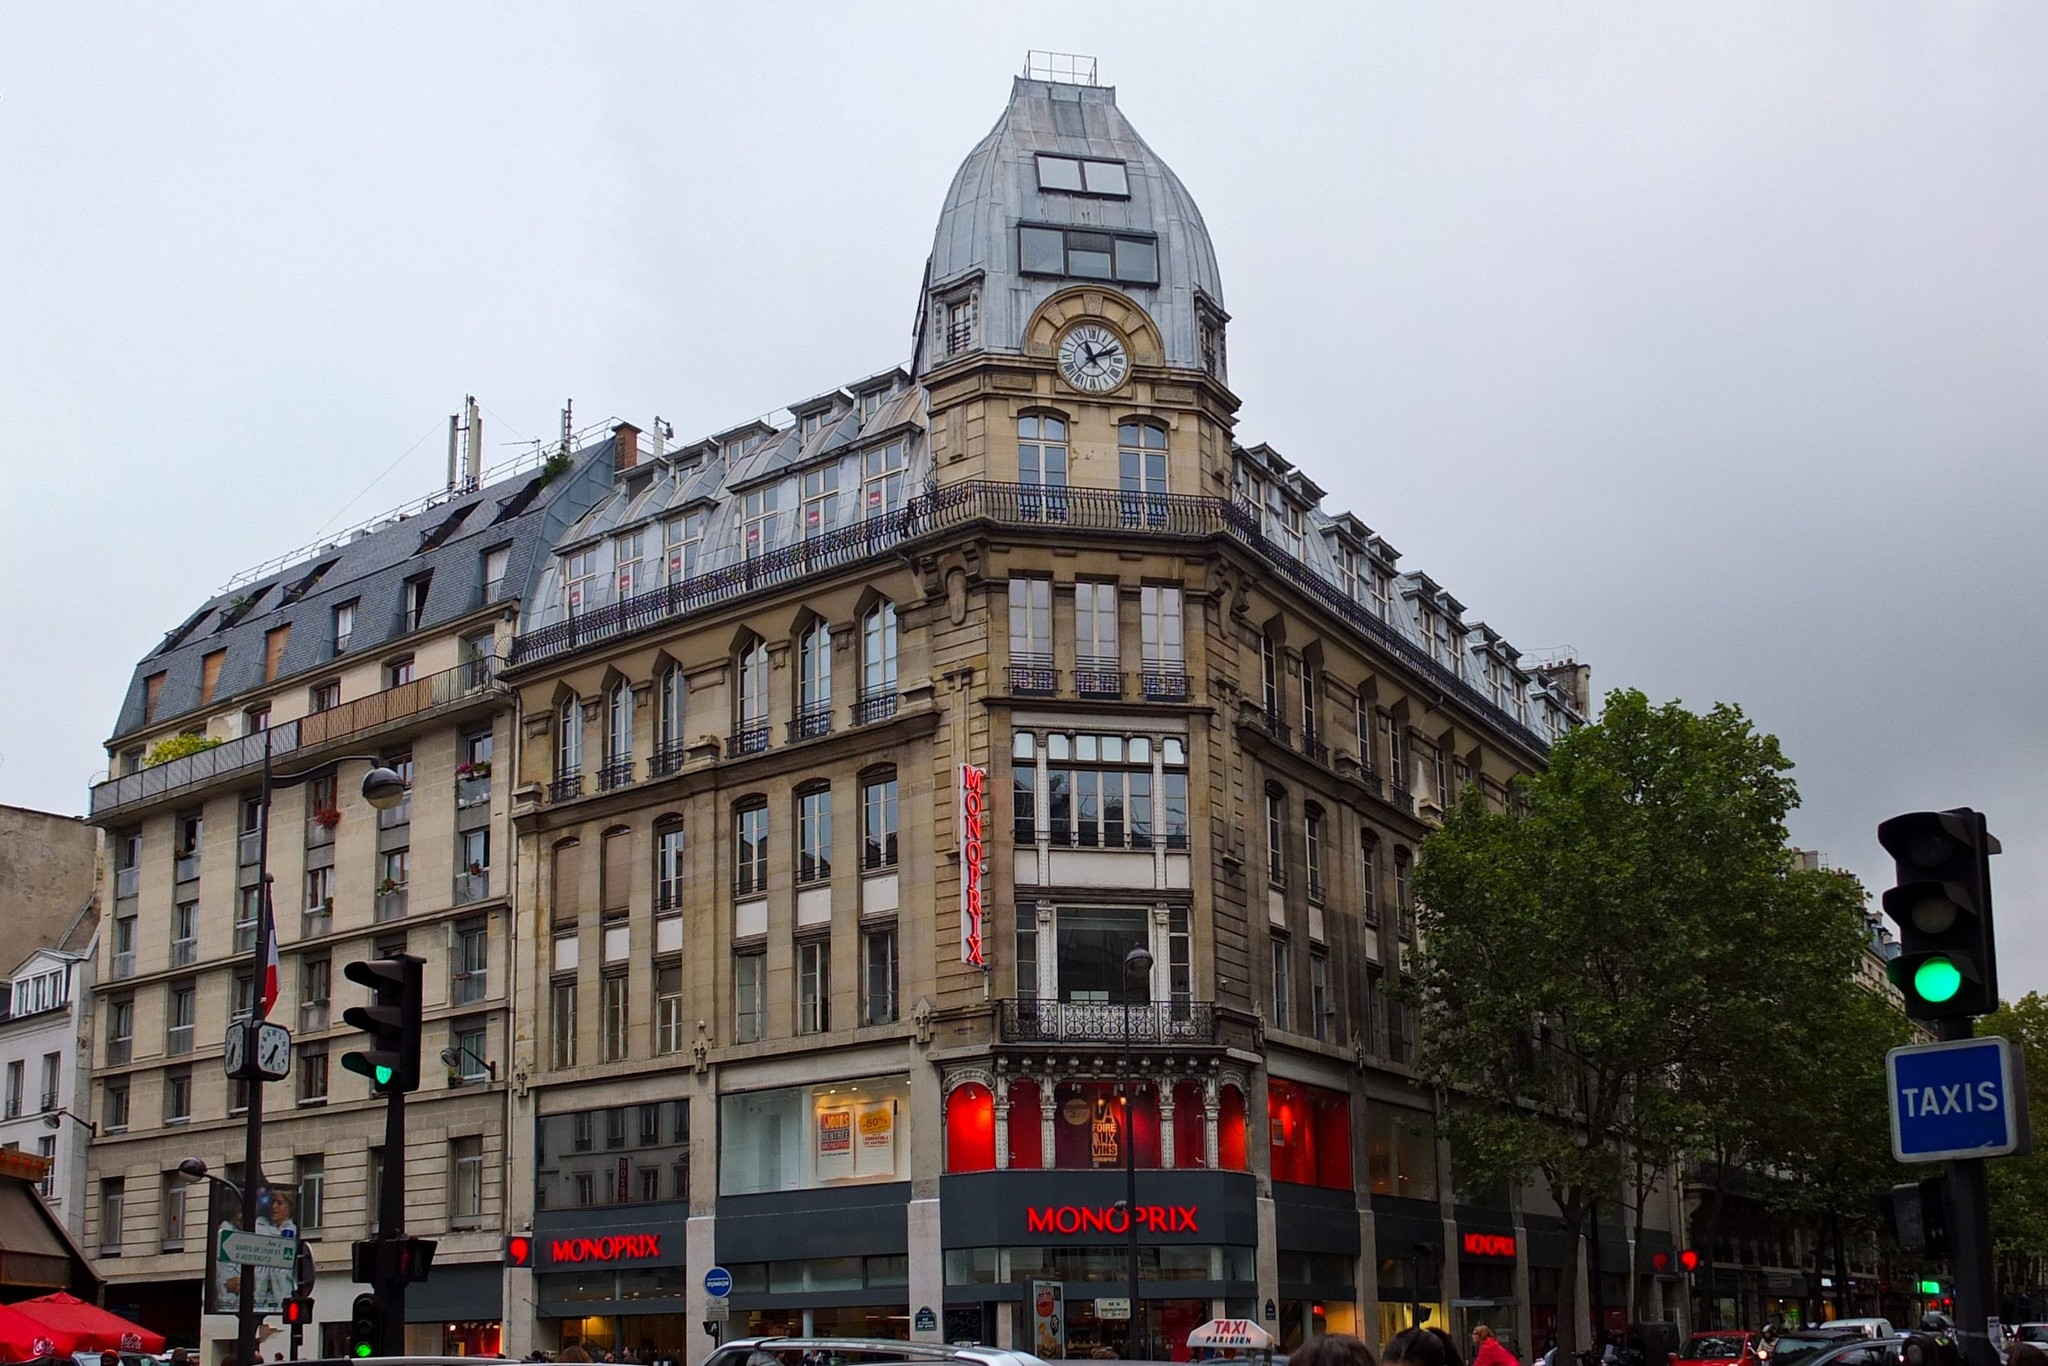 File Monoprix Rue Du Faubourg Saint Antoine Avenue Ledru Rollin Paris 2013 Jpg Wikimedia Commons